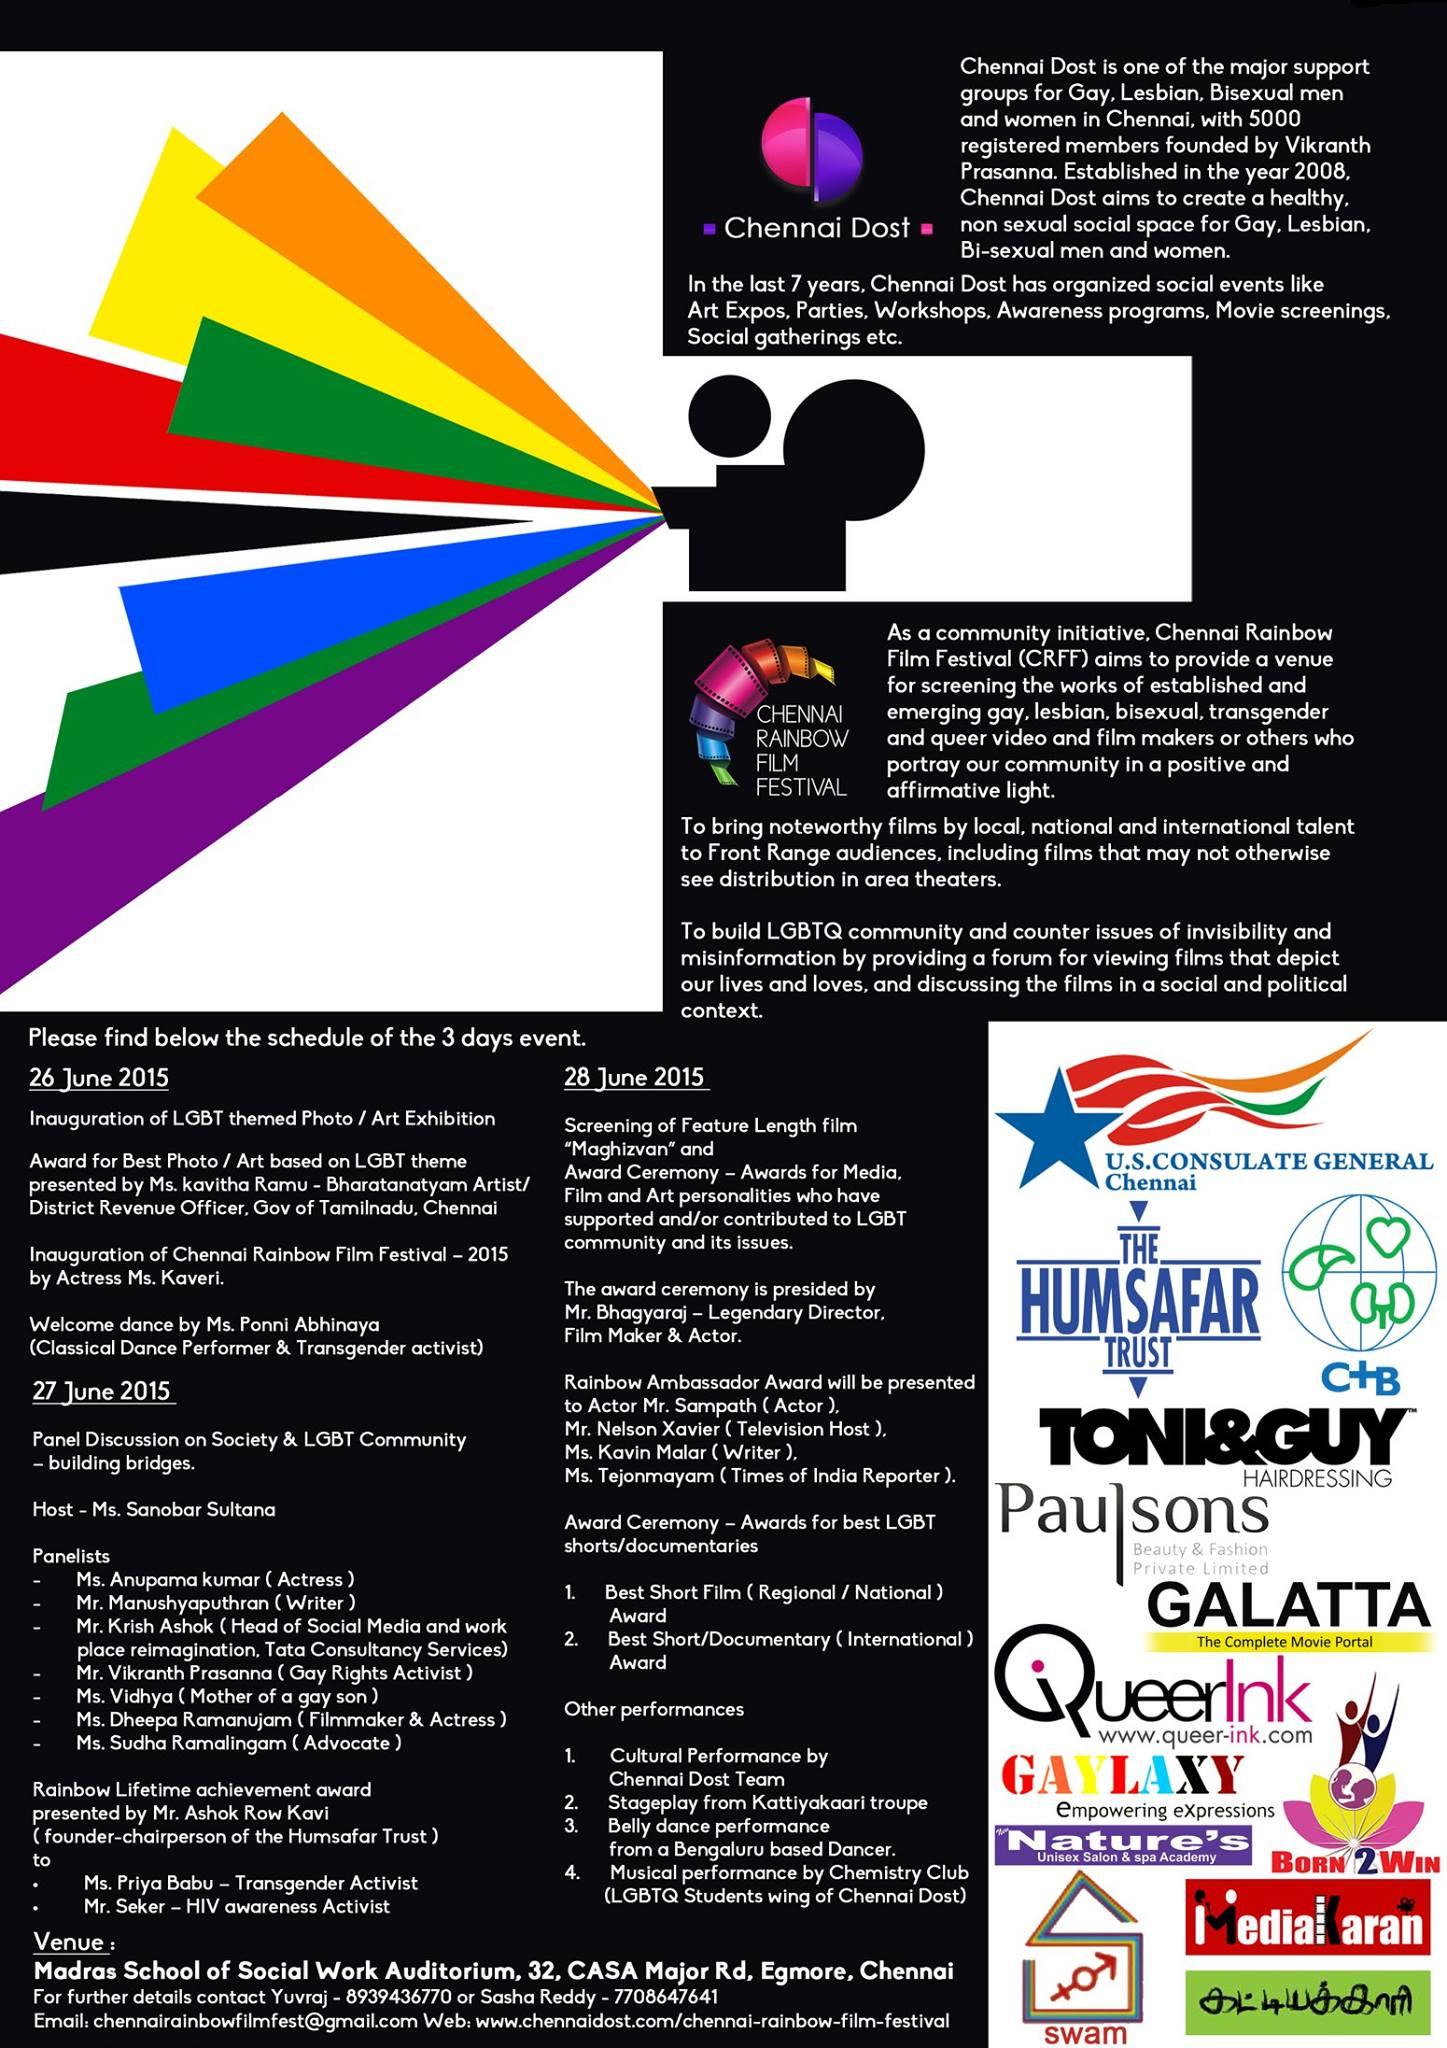 Chennai Rainbow Film Festival 2015